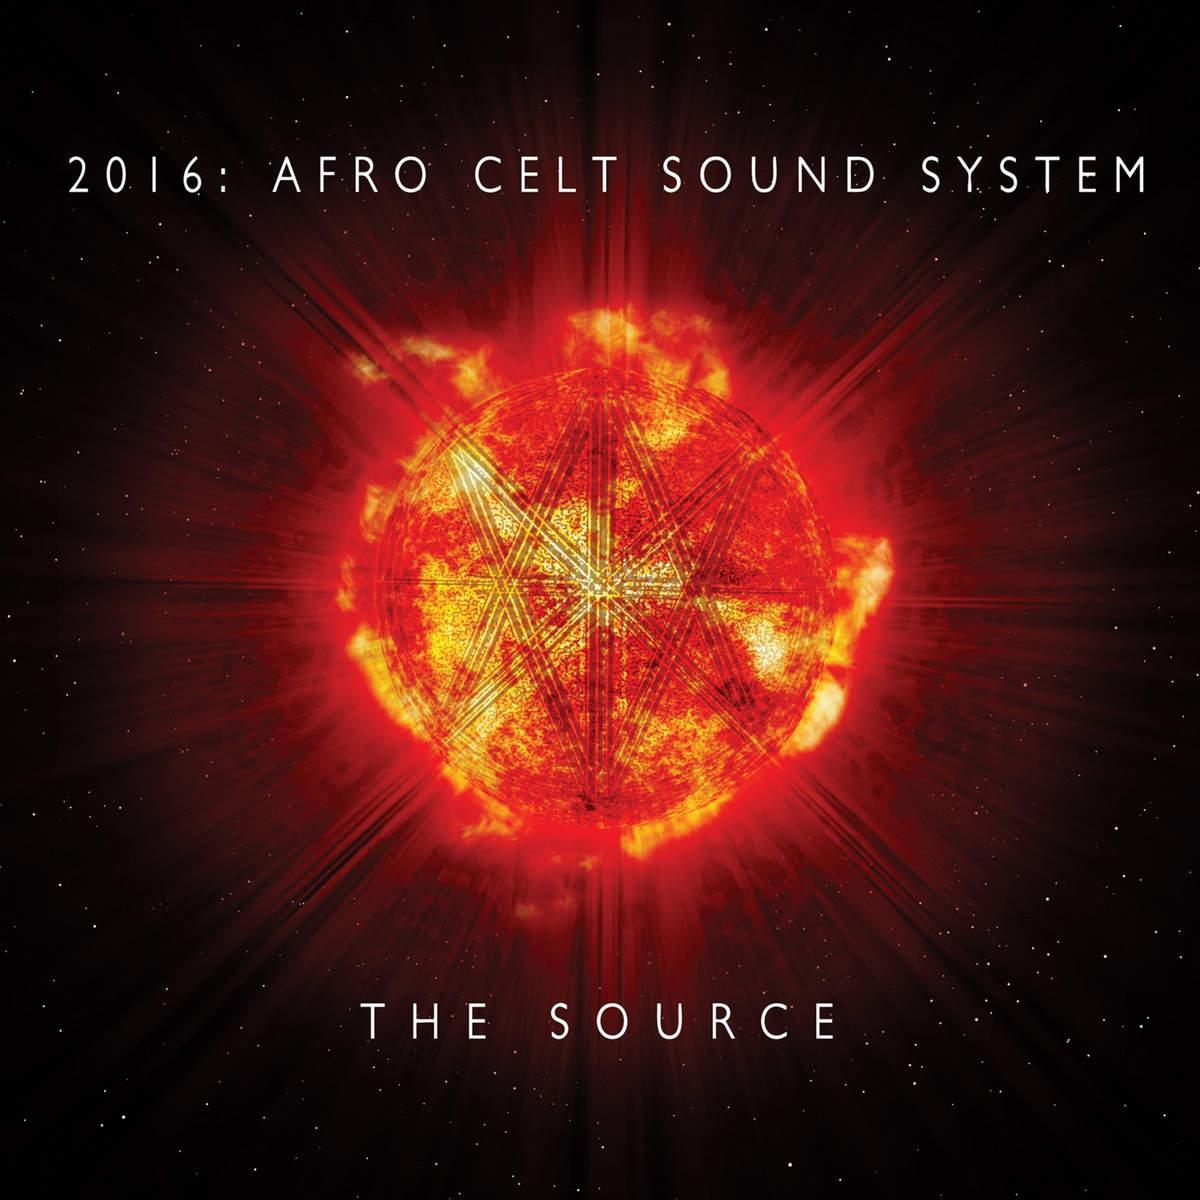 Afro Celt Sound System - The Source (2016)